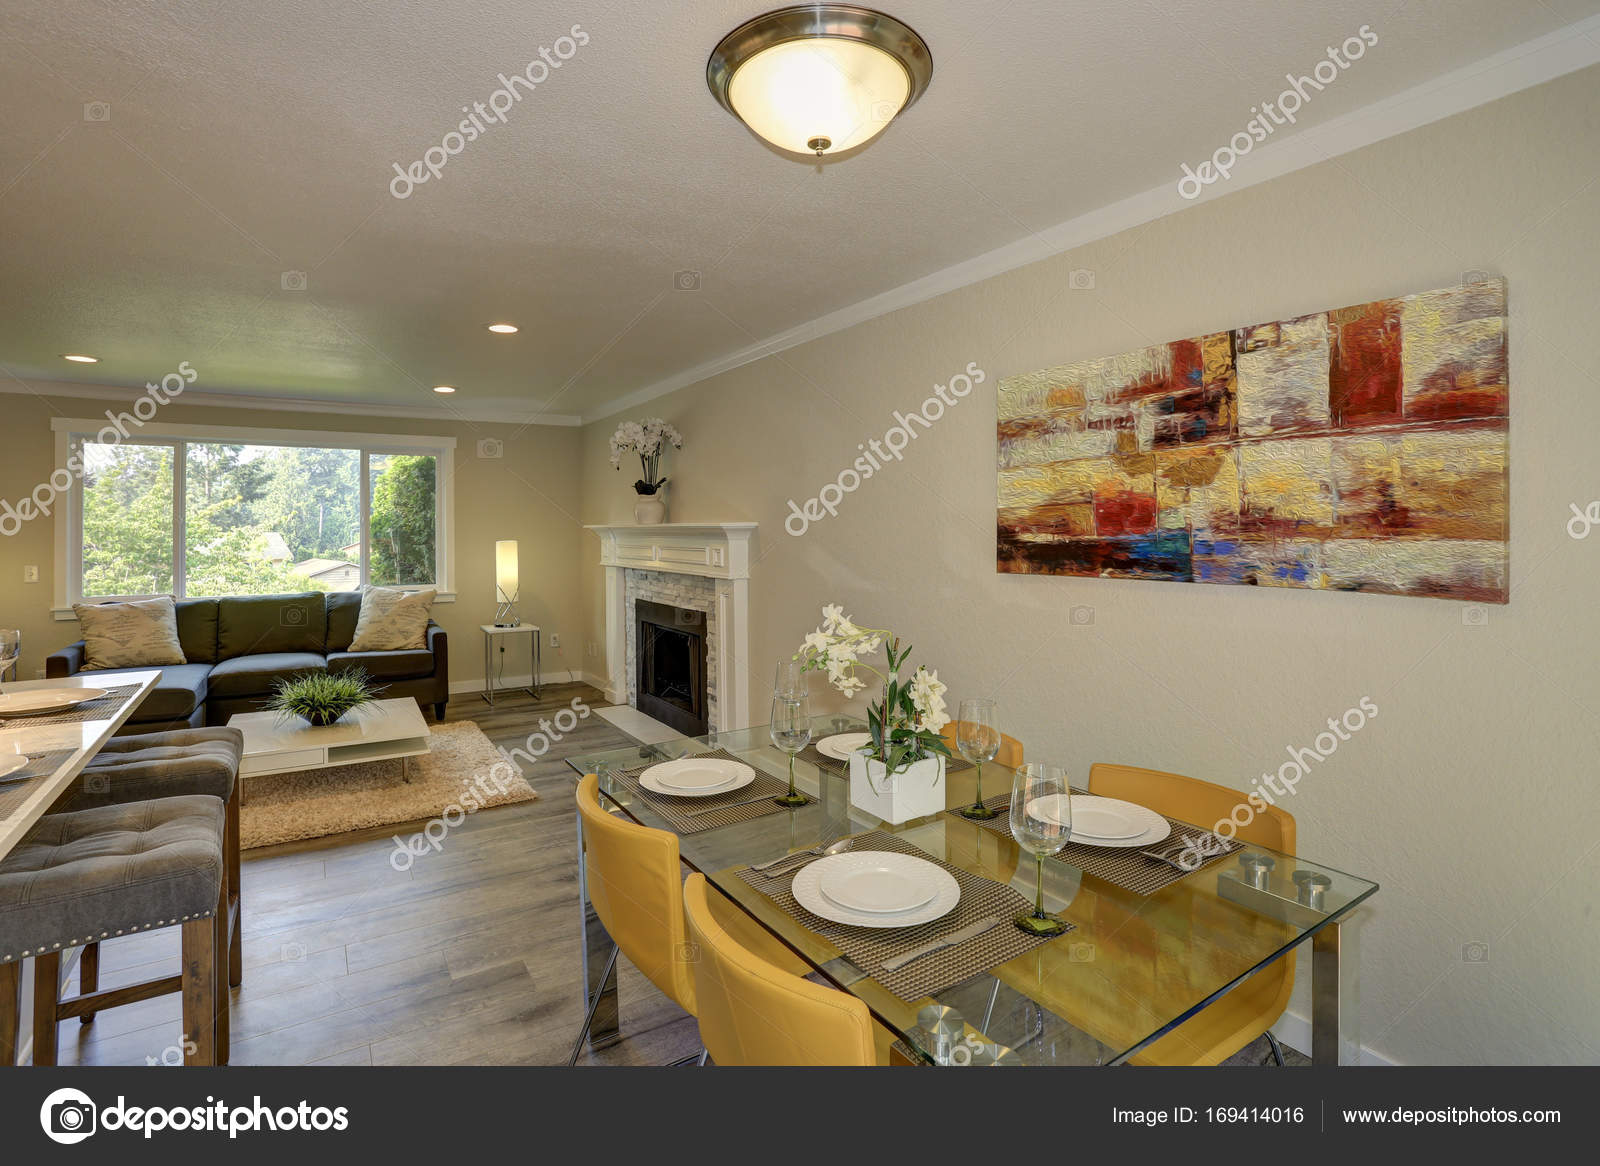 small kitchen plans kidkraft grand espresso corner 53271 美丽的开放计划二楼厨房与用餐空间 图库照片 c alabn 169414016